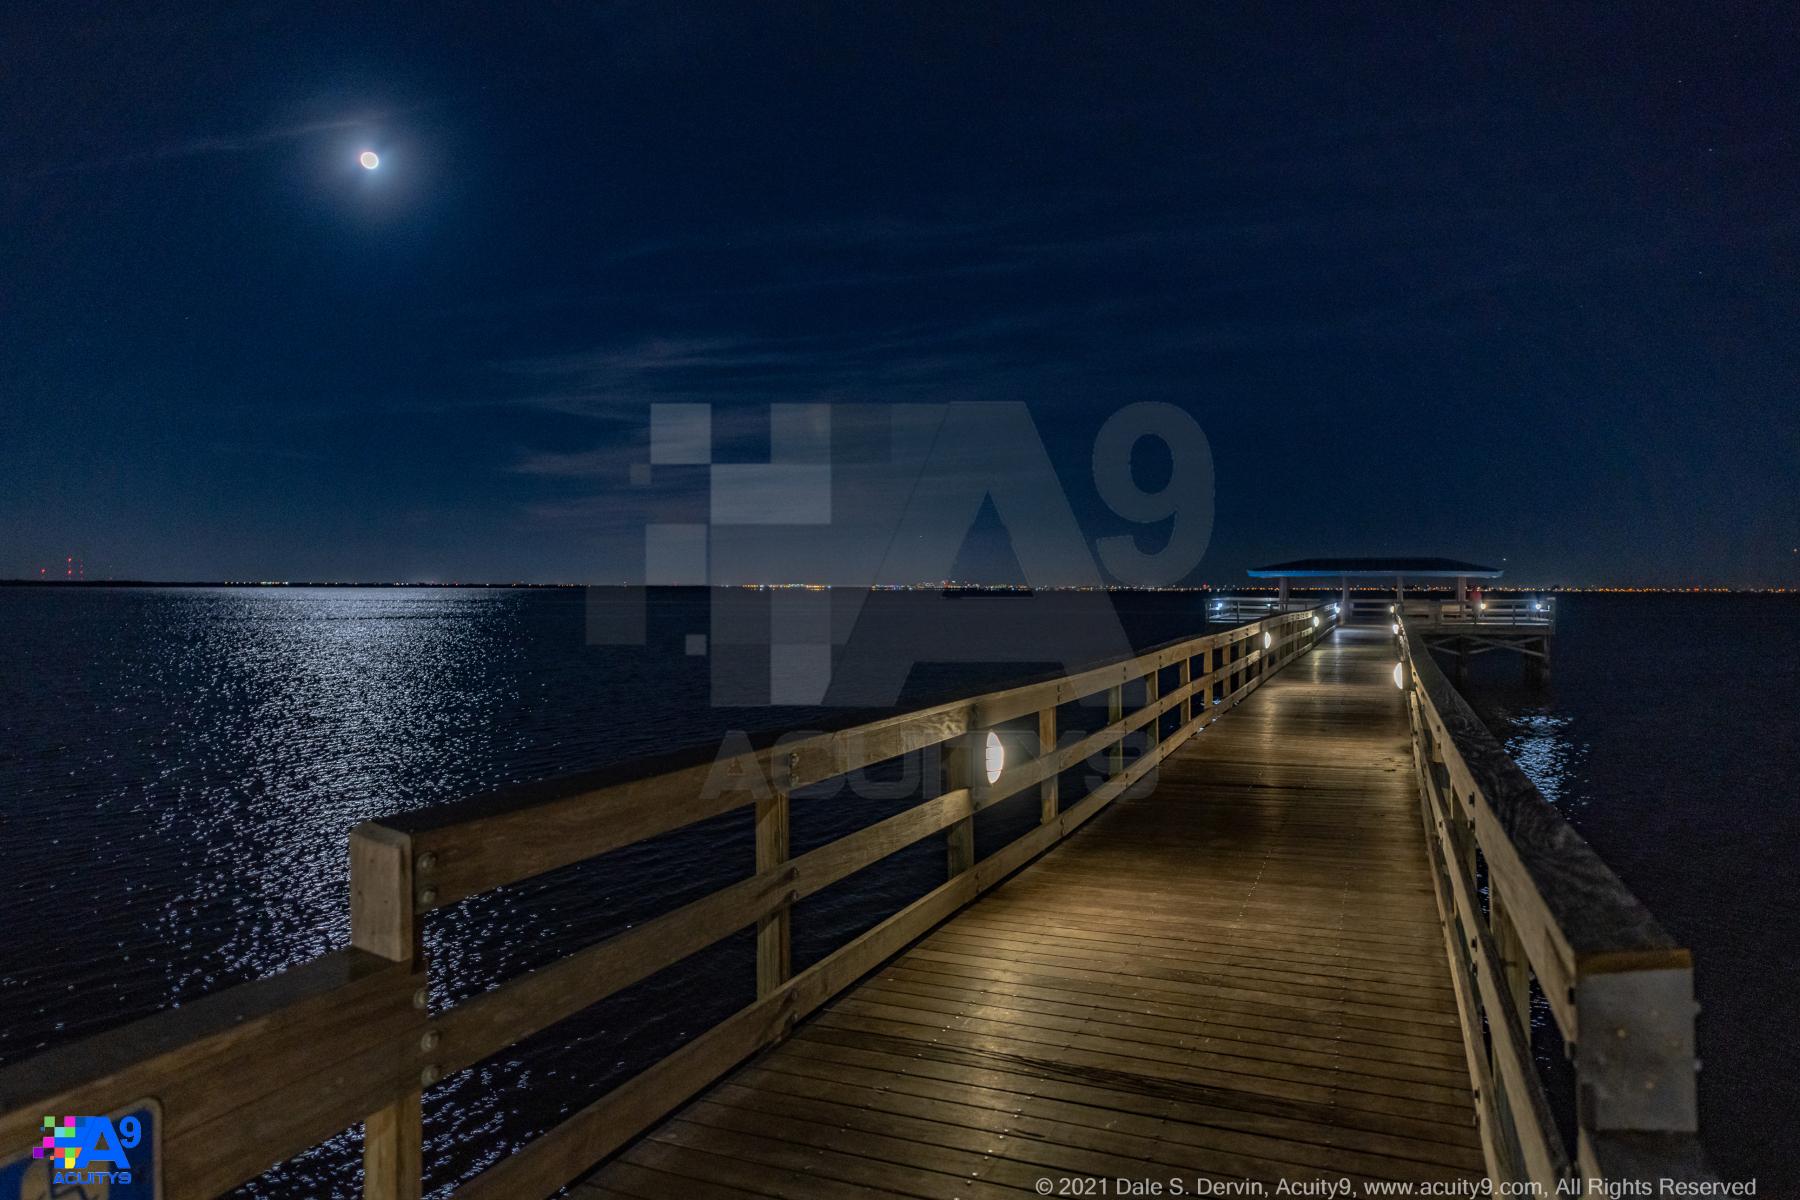 Full Moon on the Pier